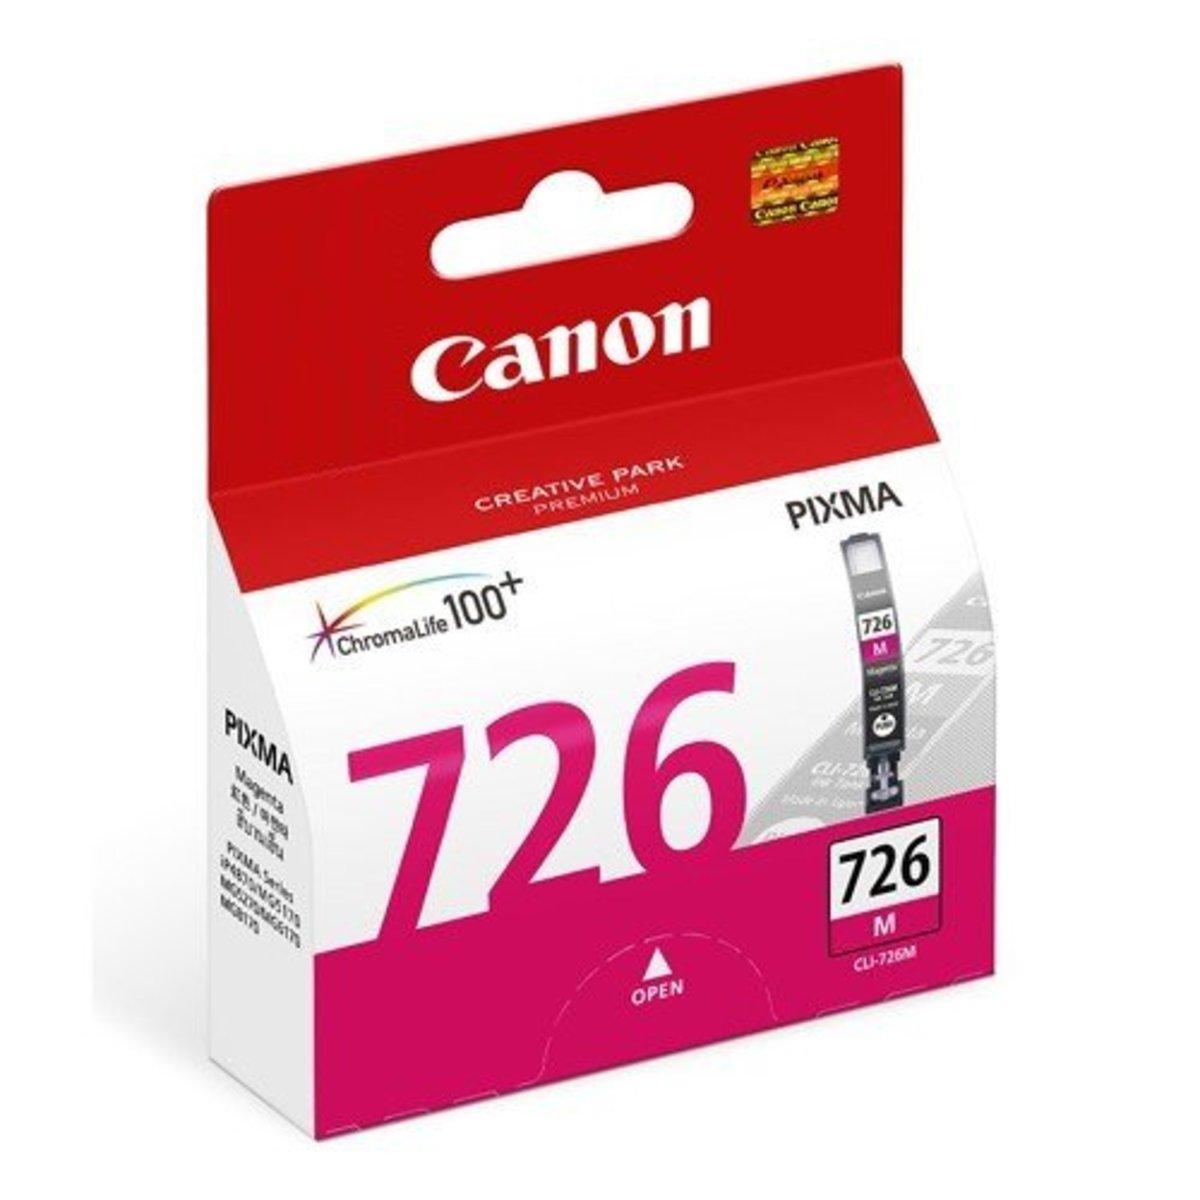 CANON CLI-726 MAGENTA INK